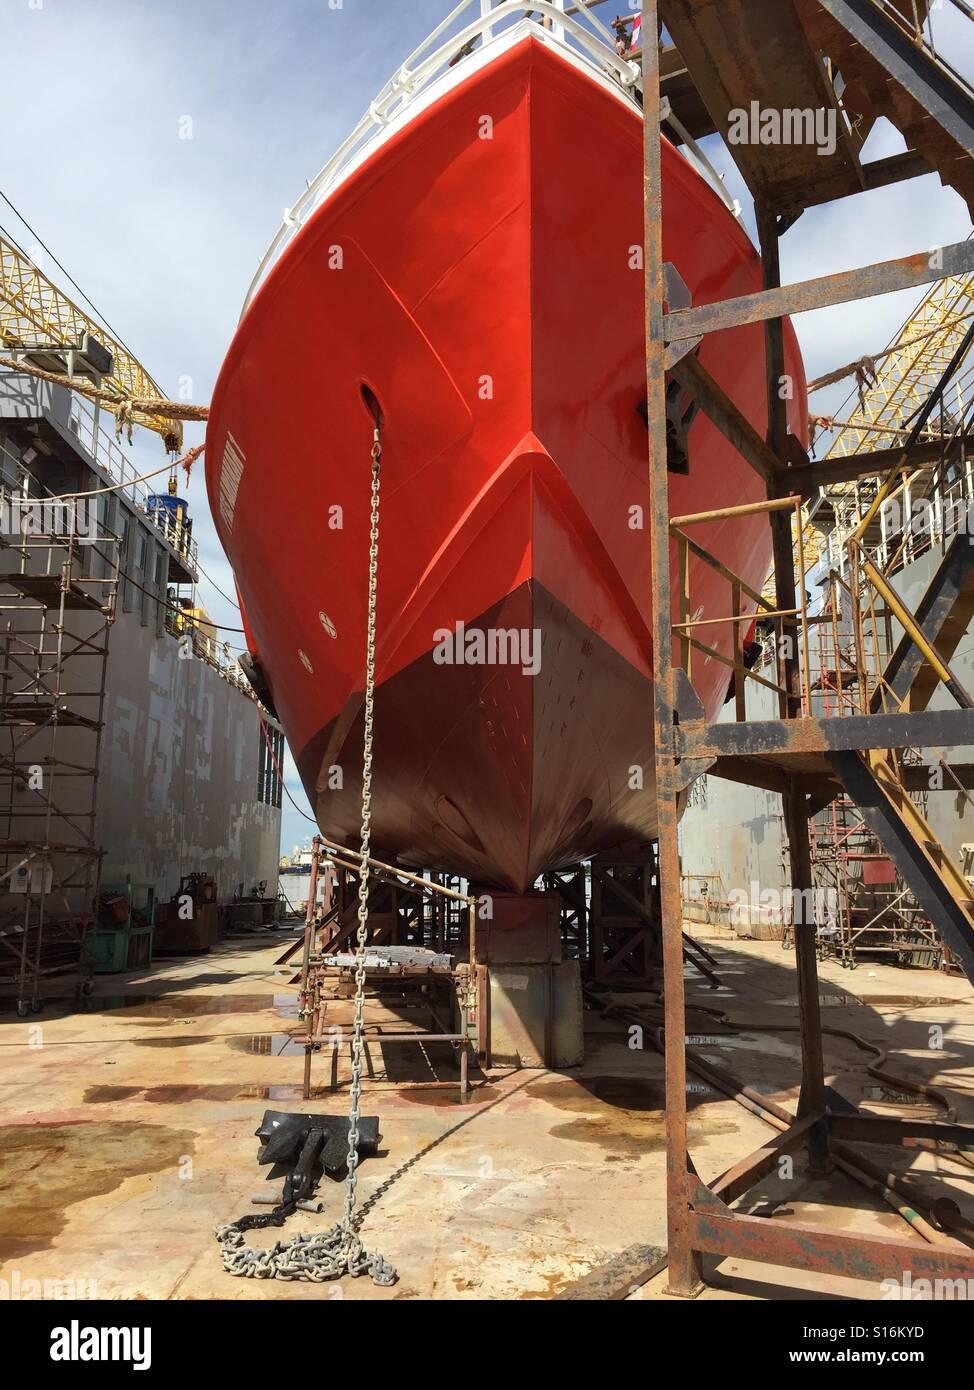 crewboat in drydock - Stock Image